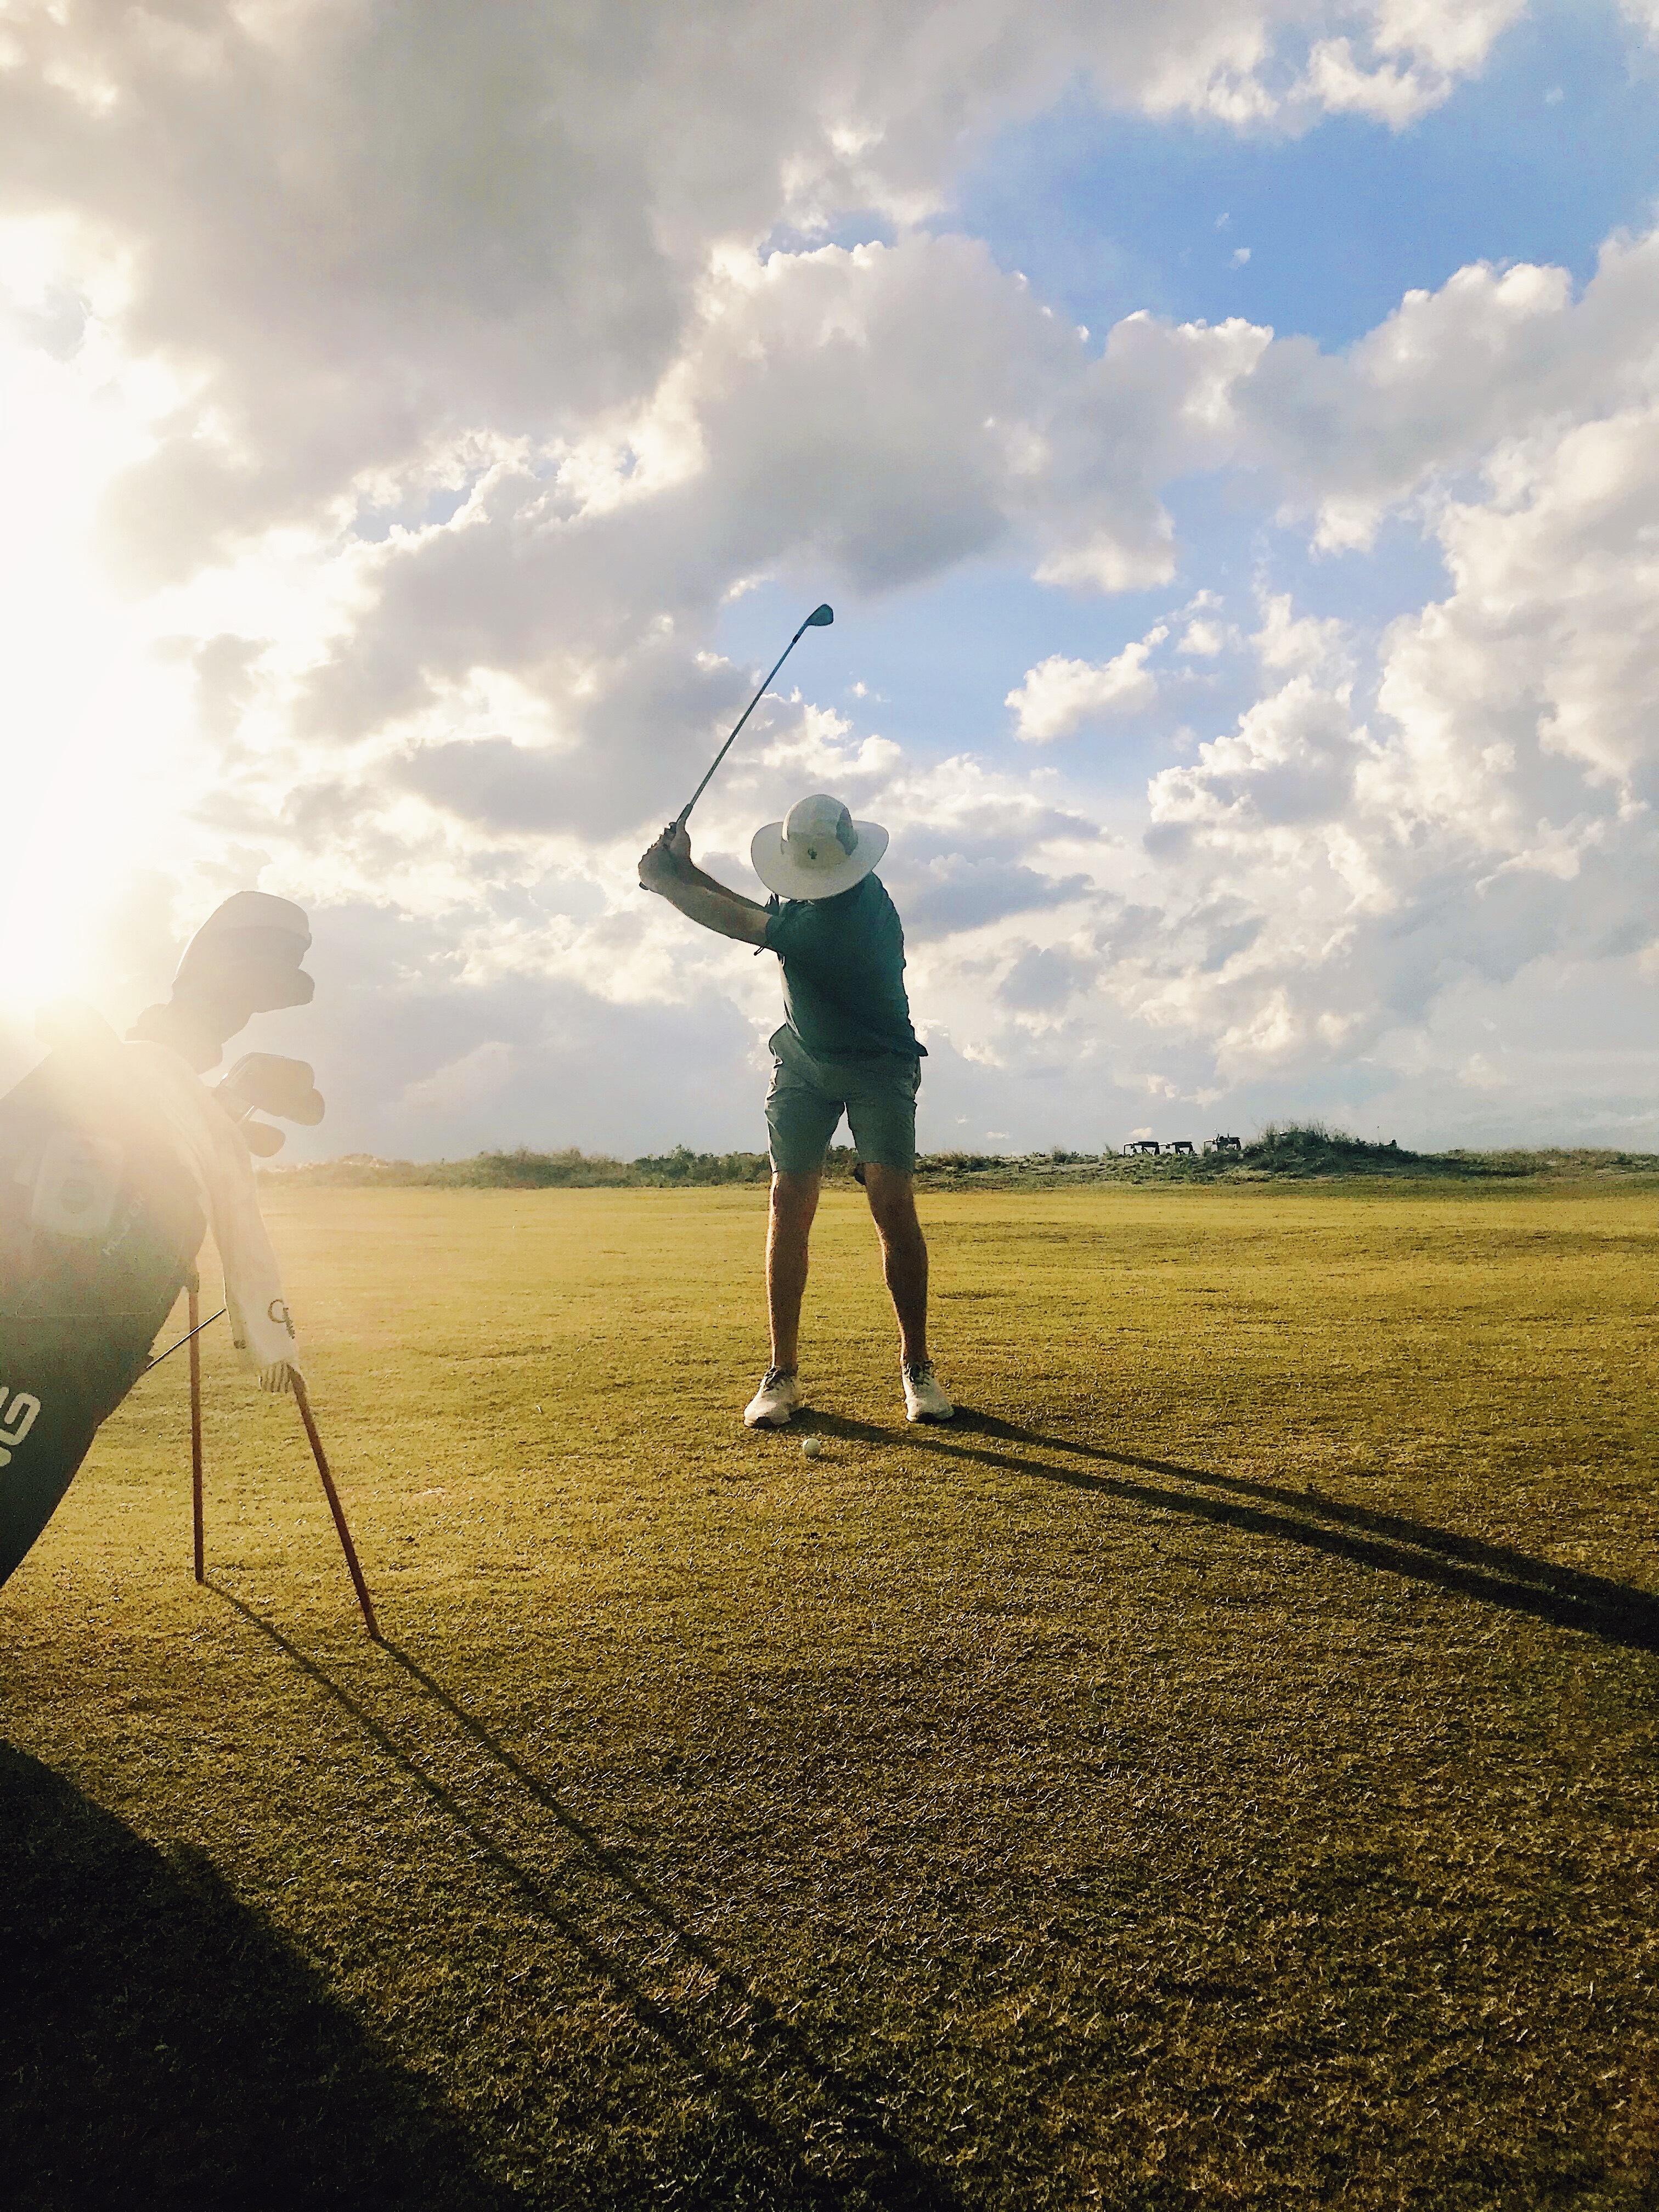 man swinging golf club in setting sun